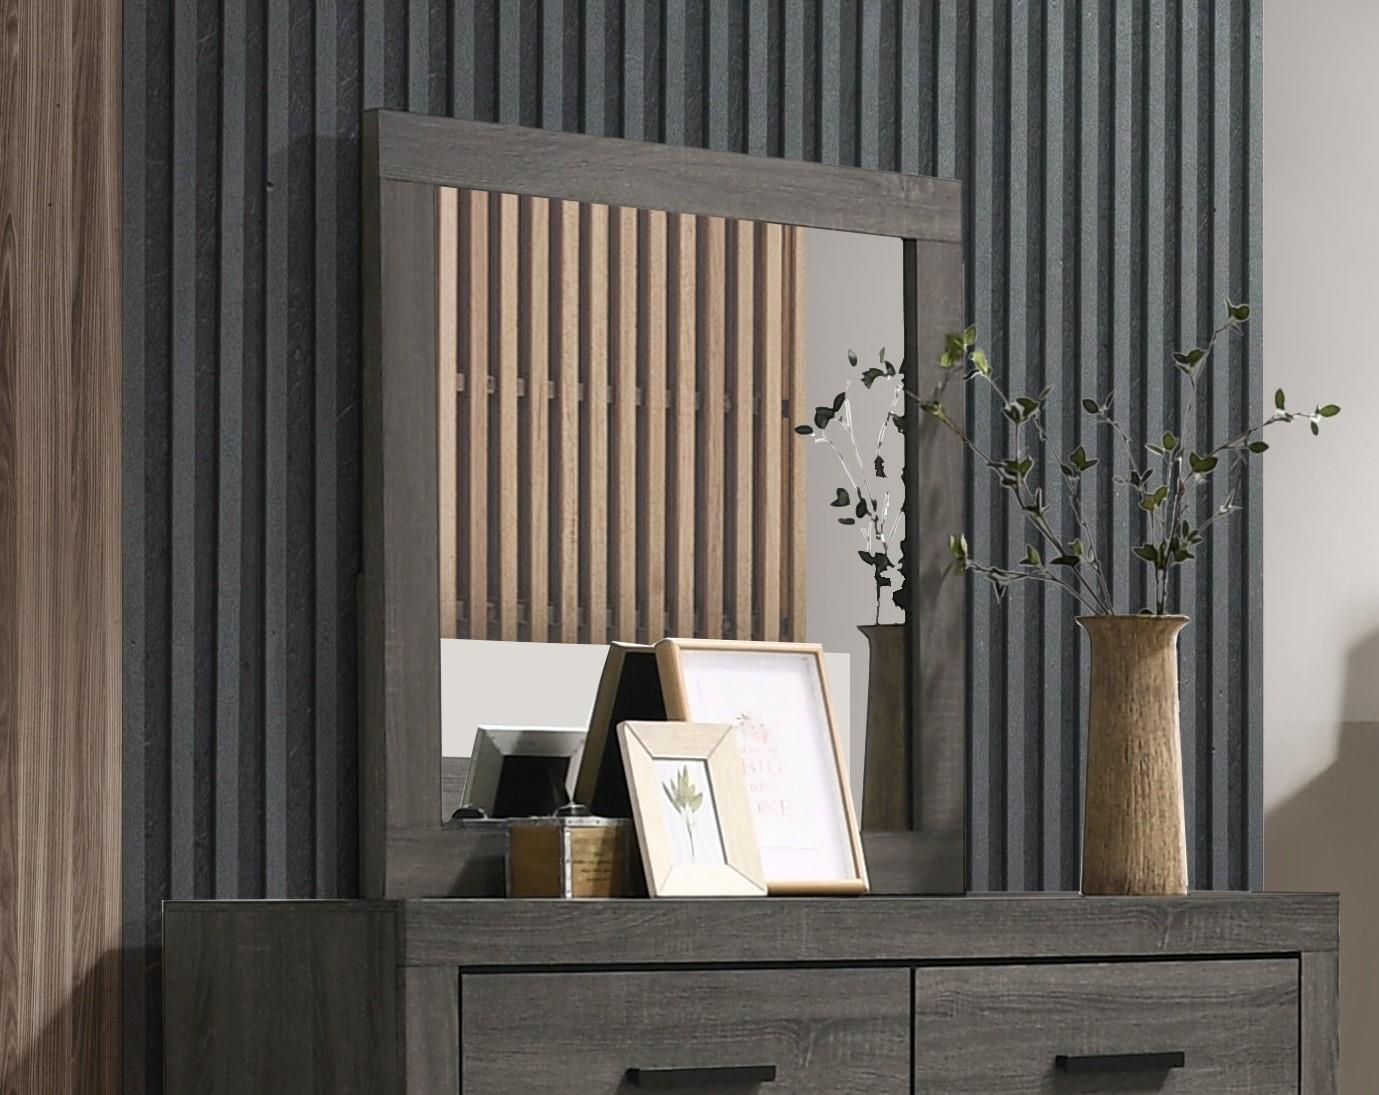 C8321A Mirror by Lifestyle at Furniture Fair - North Carolina